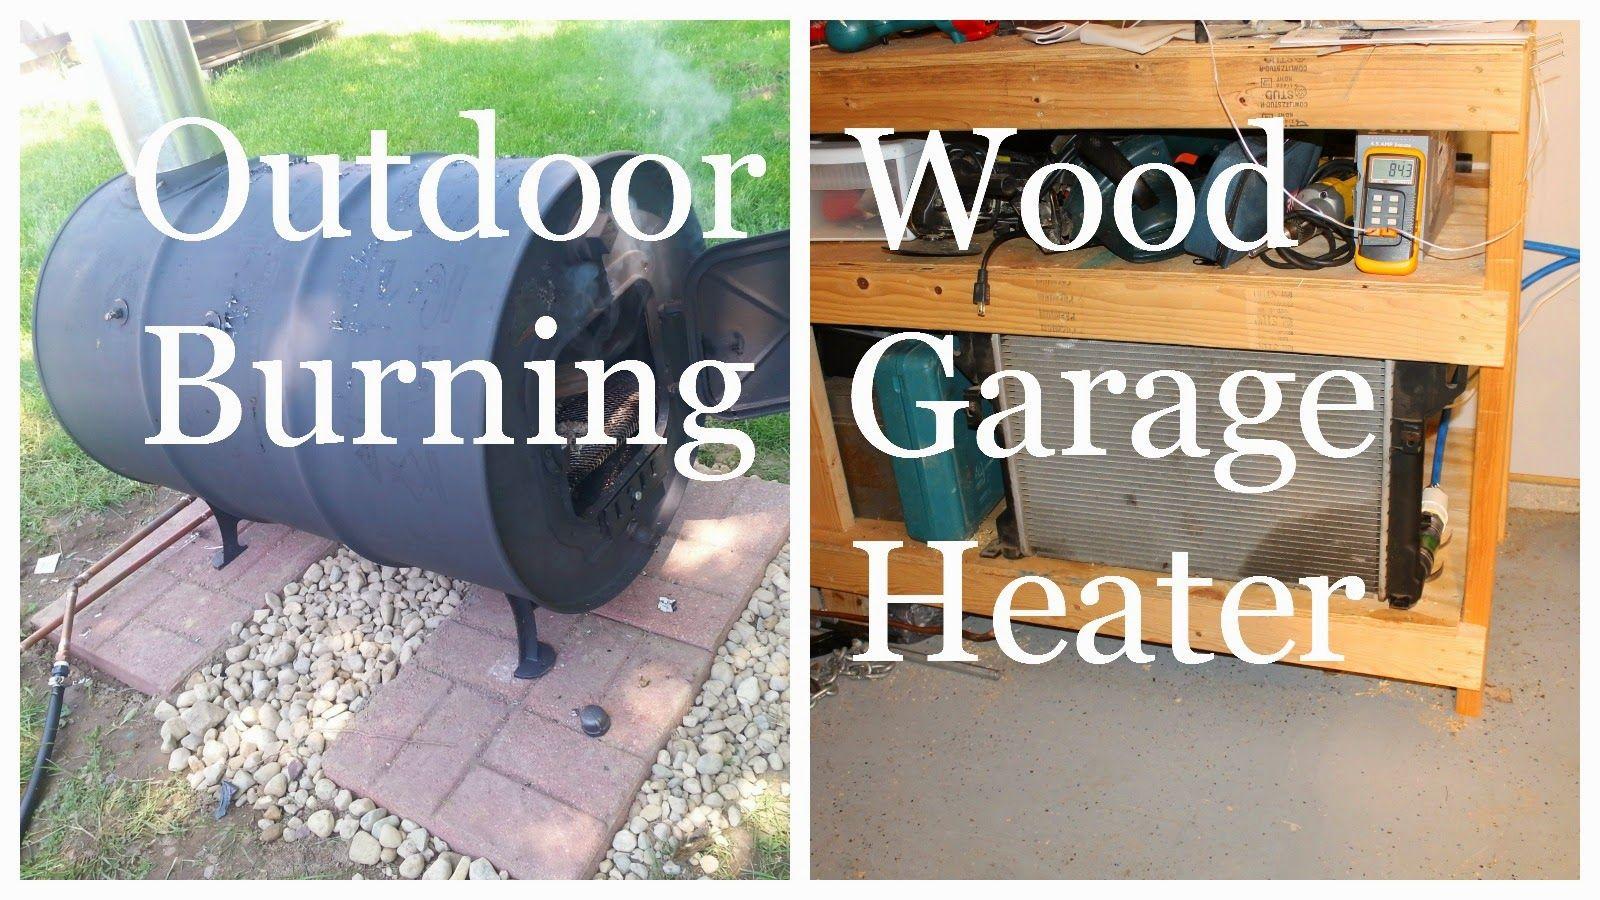 Outdoor Wood Burning Garage Heater   Heat Your Garage For Free Using A Car  Radiator!